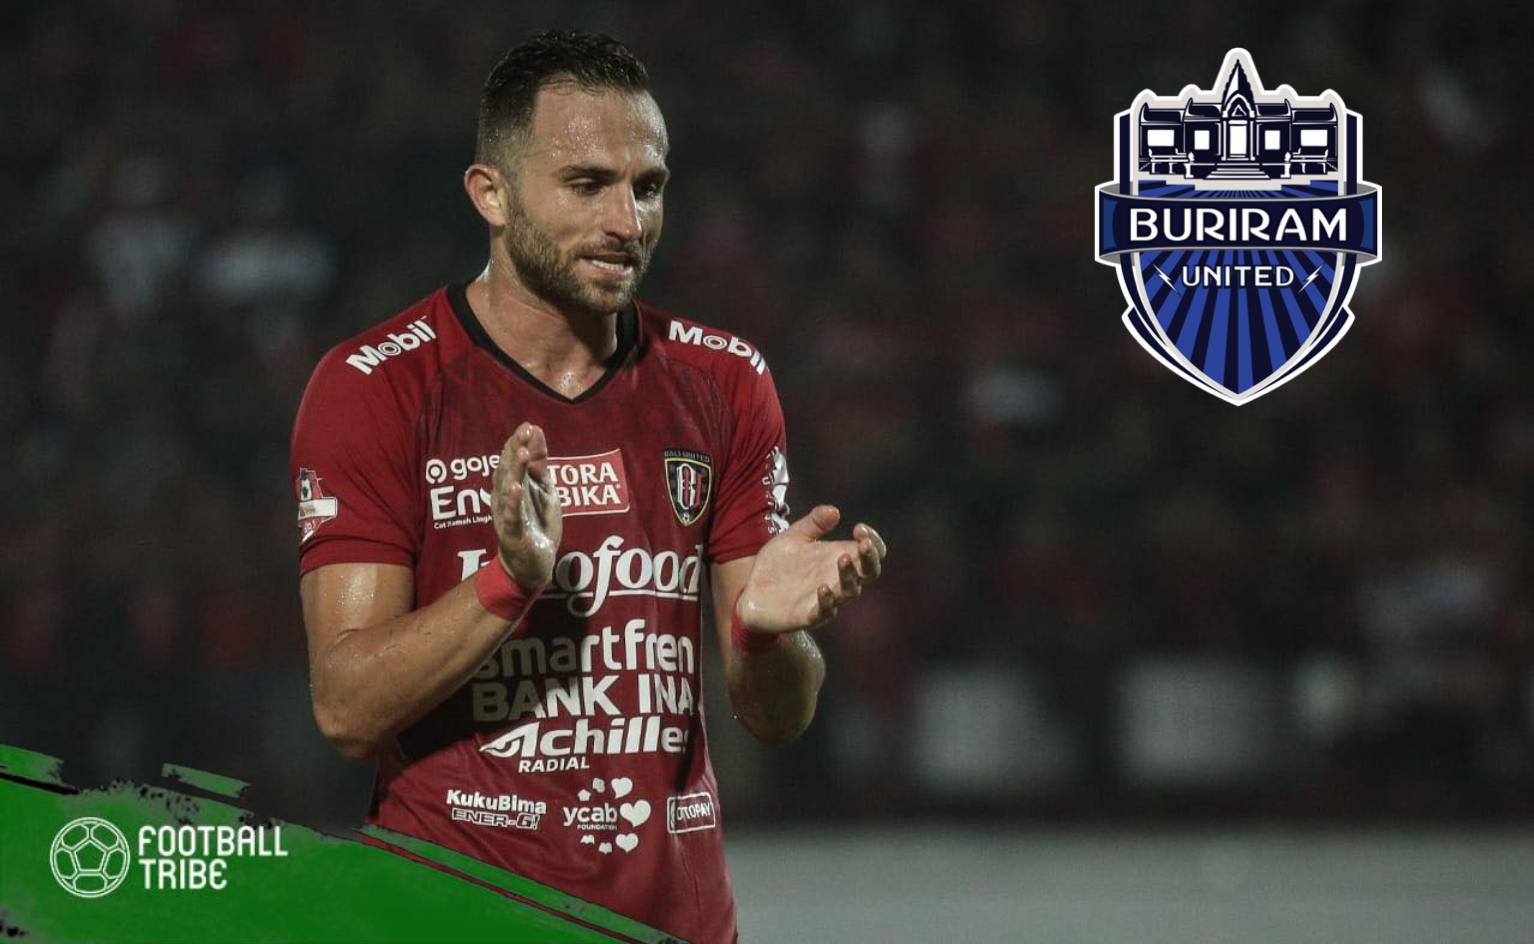 Buriram United Target Bali's Naturalised Striker Ilija Spasojevic